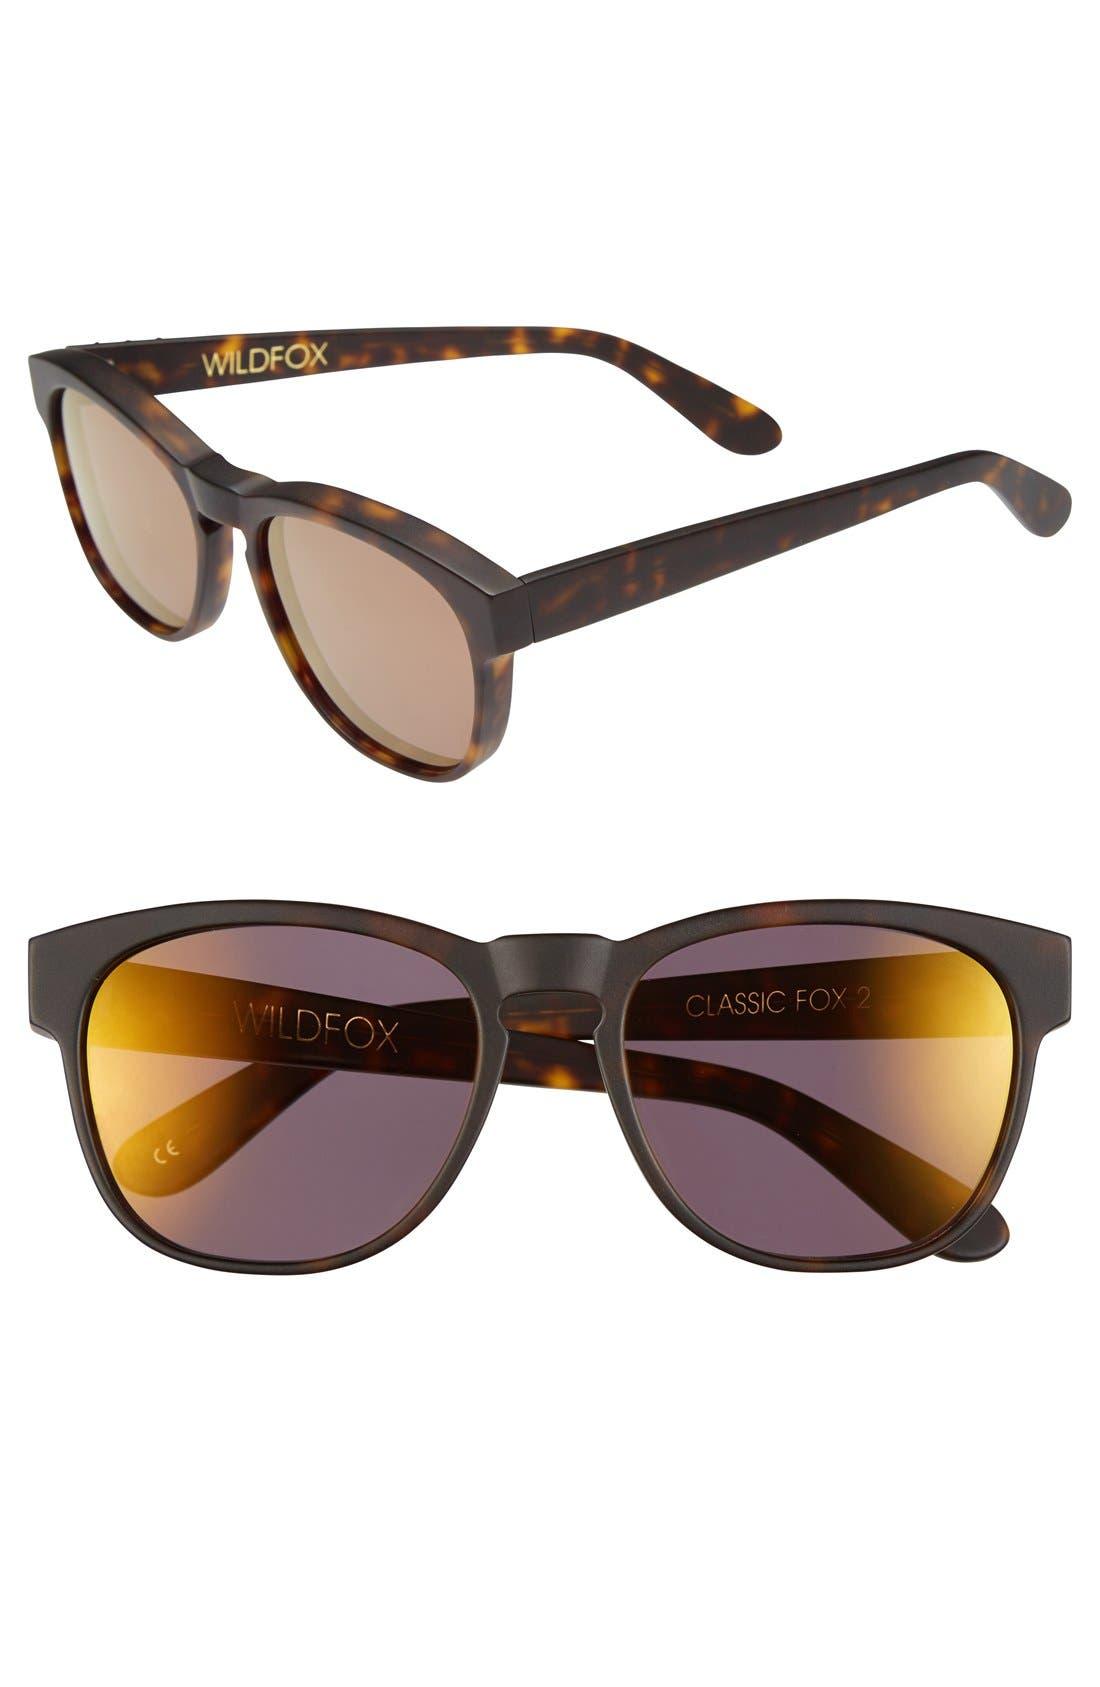 Main Image - Wildfox 'Classic Fox 2 Deluxe' 52mm Sunglasses